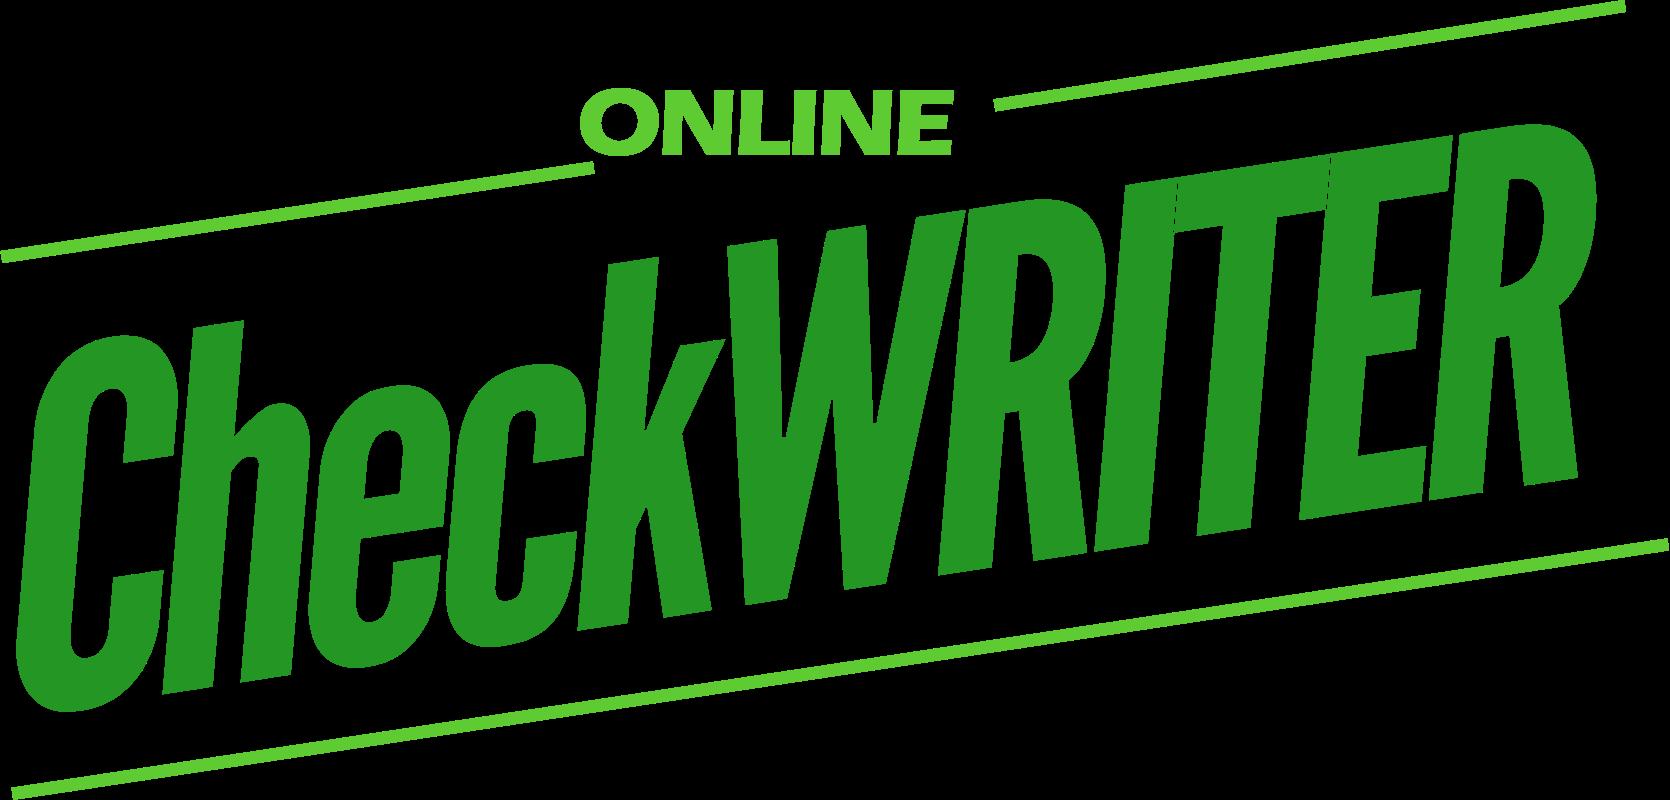 Bank of America Checks Online Check Writer Online